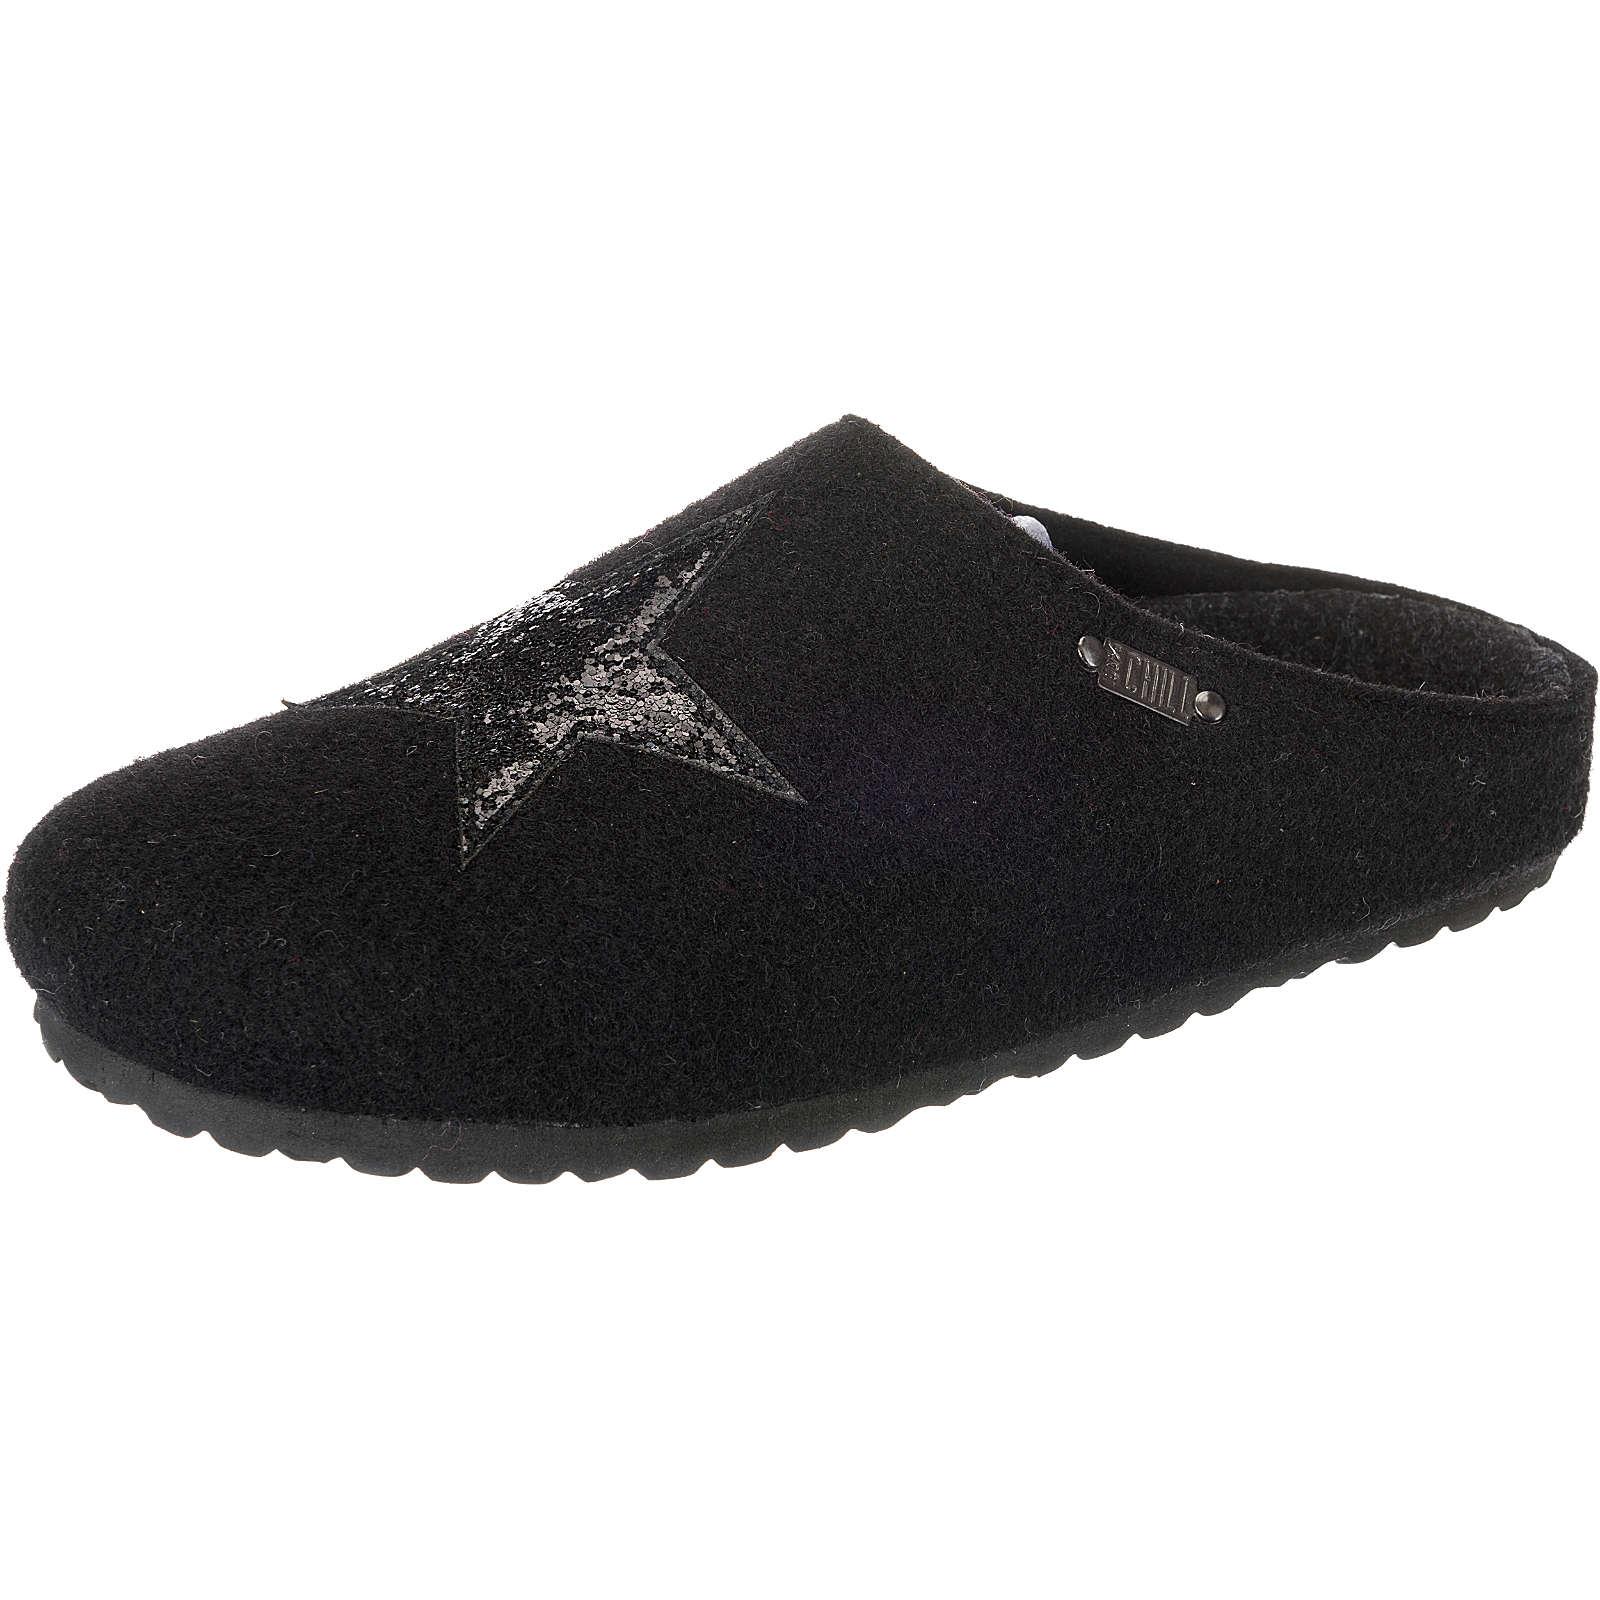 Jane Klain Pantoffeln schwarz Damen Gr. 42